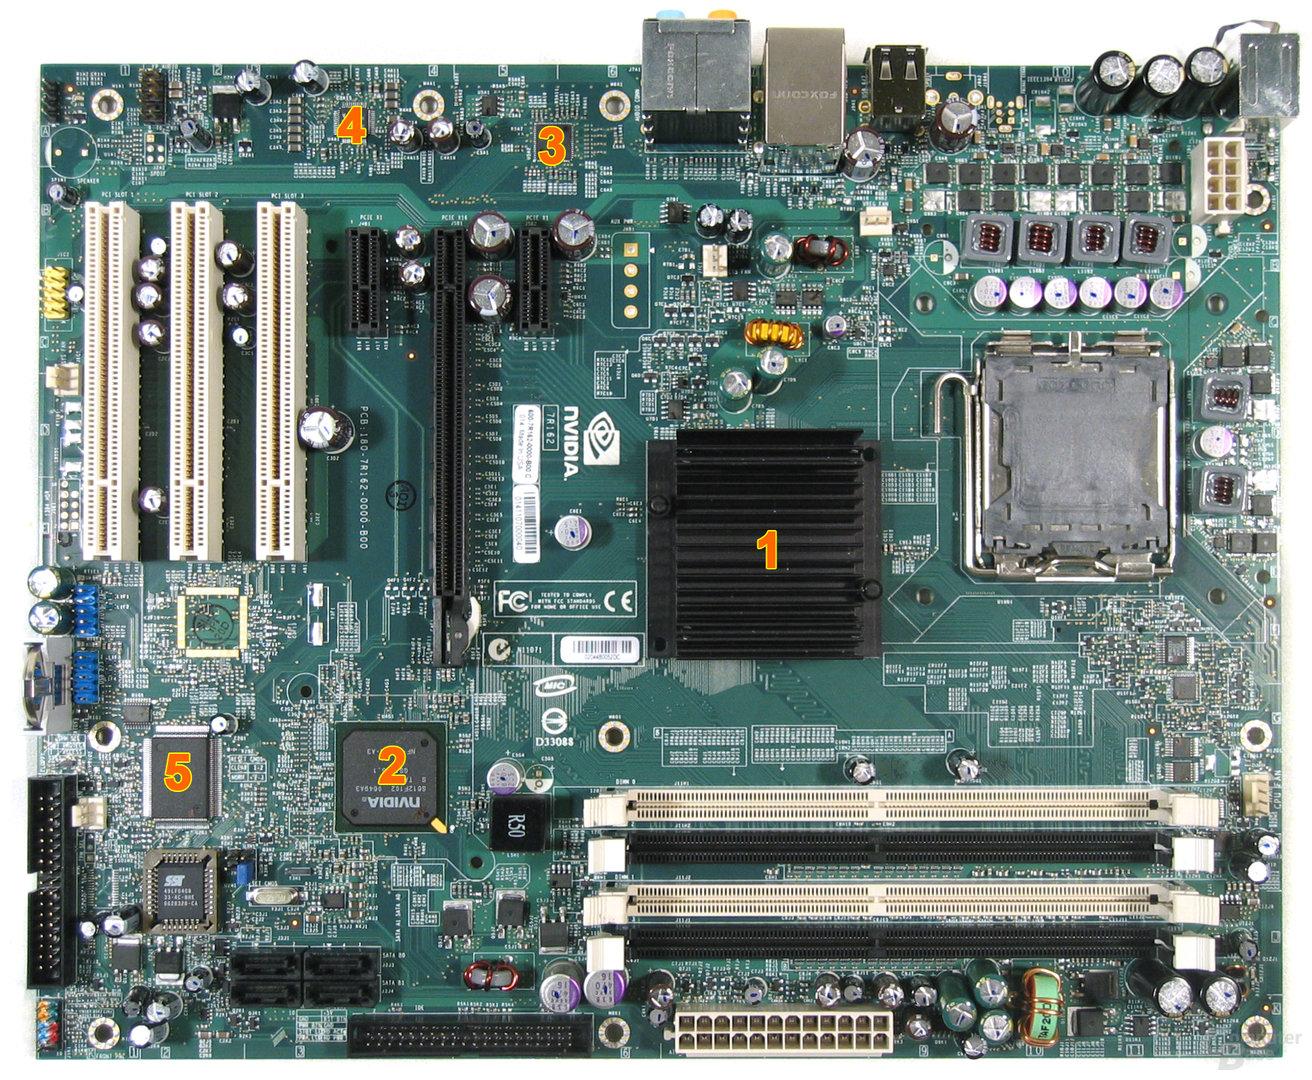 EVGA 122-CK-NF66 Komponenten